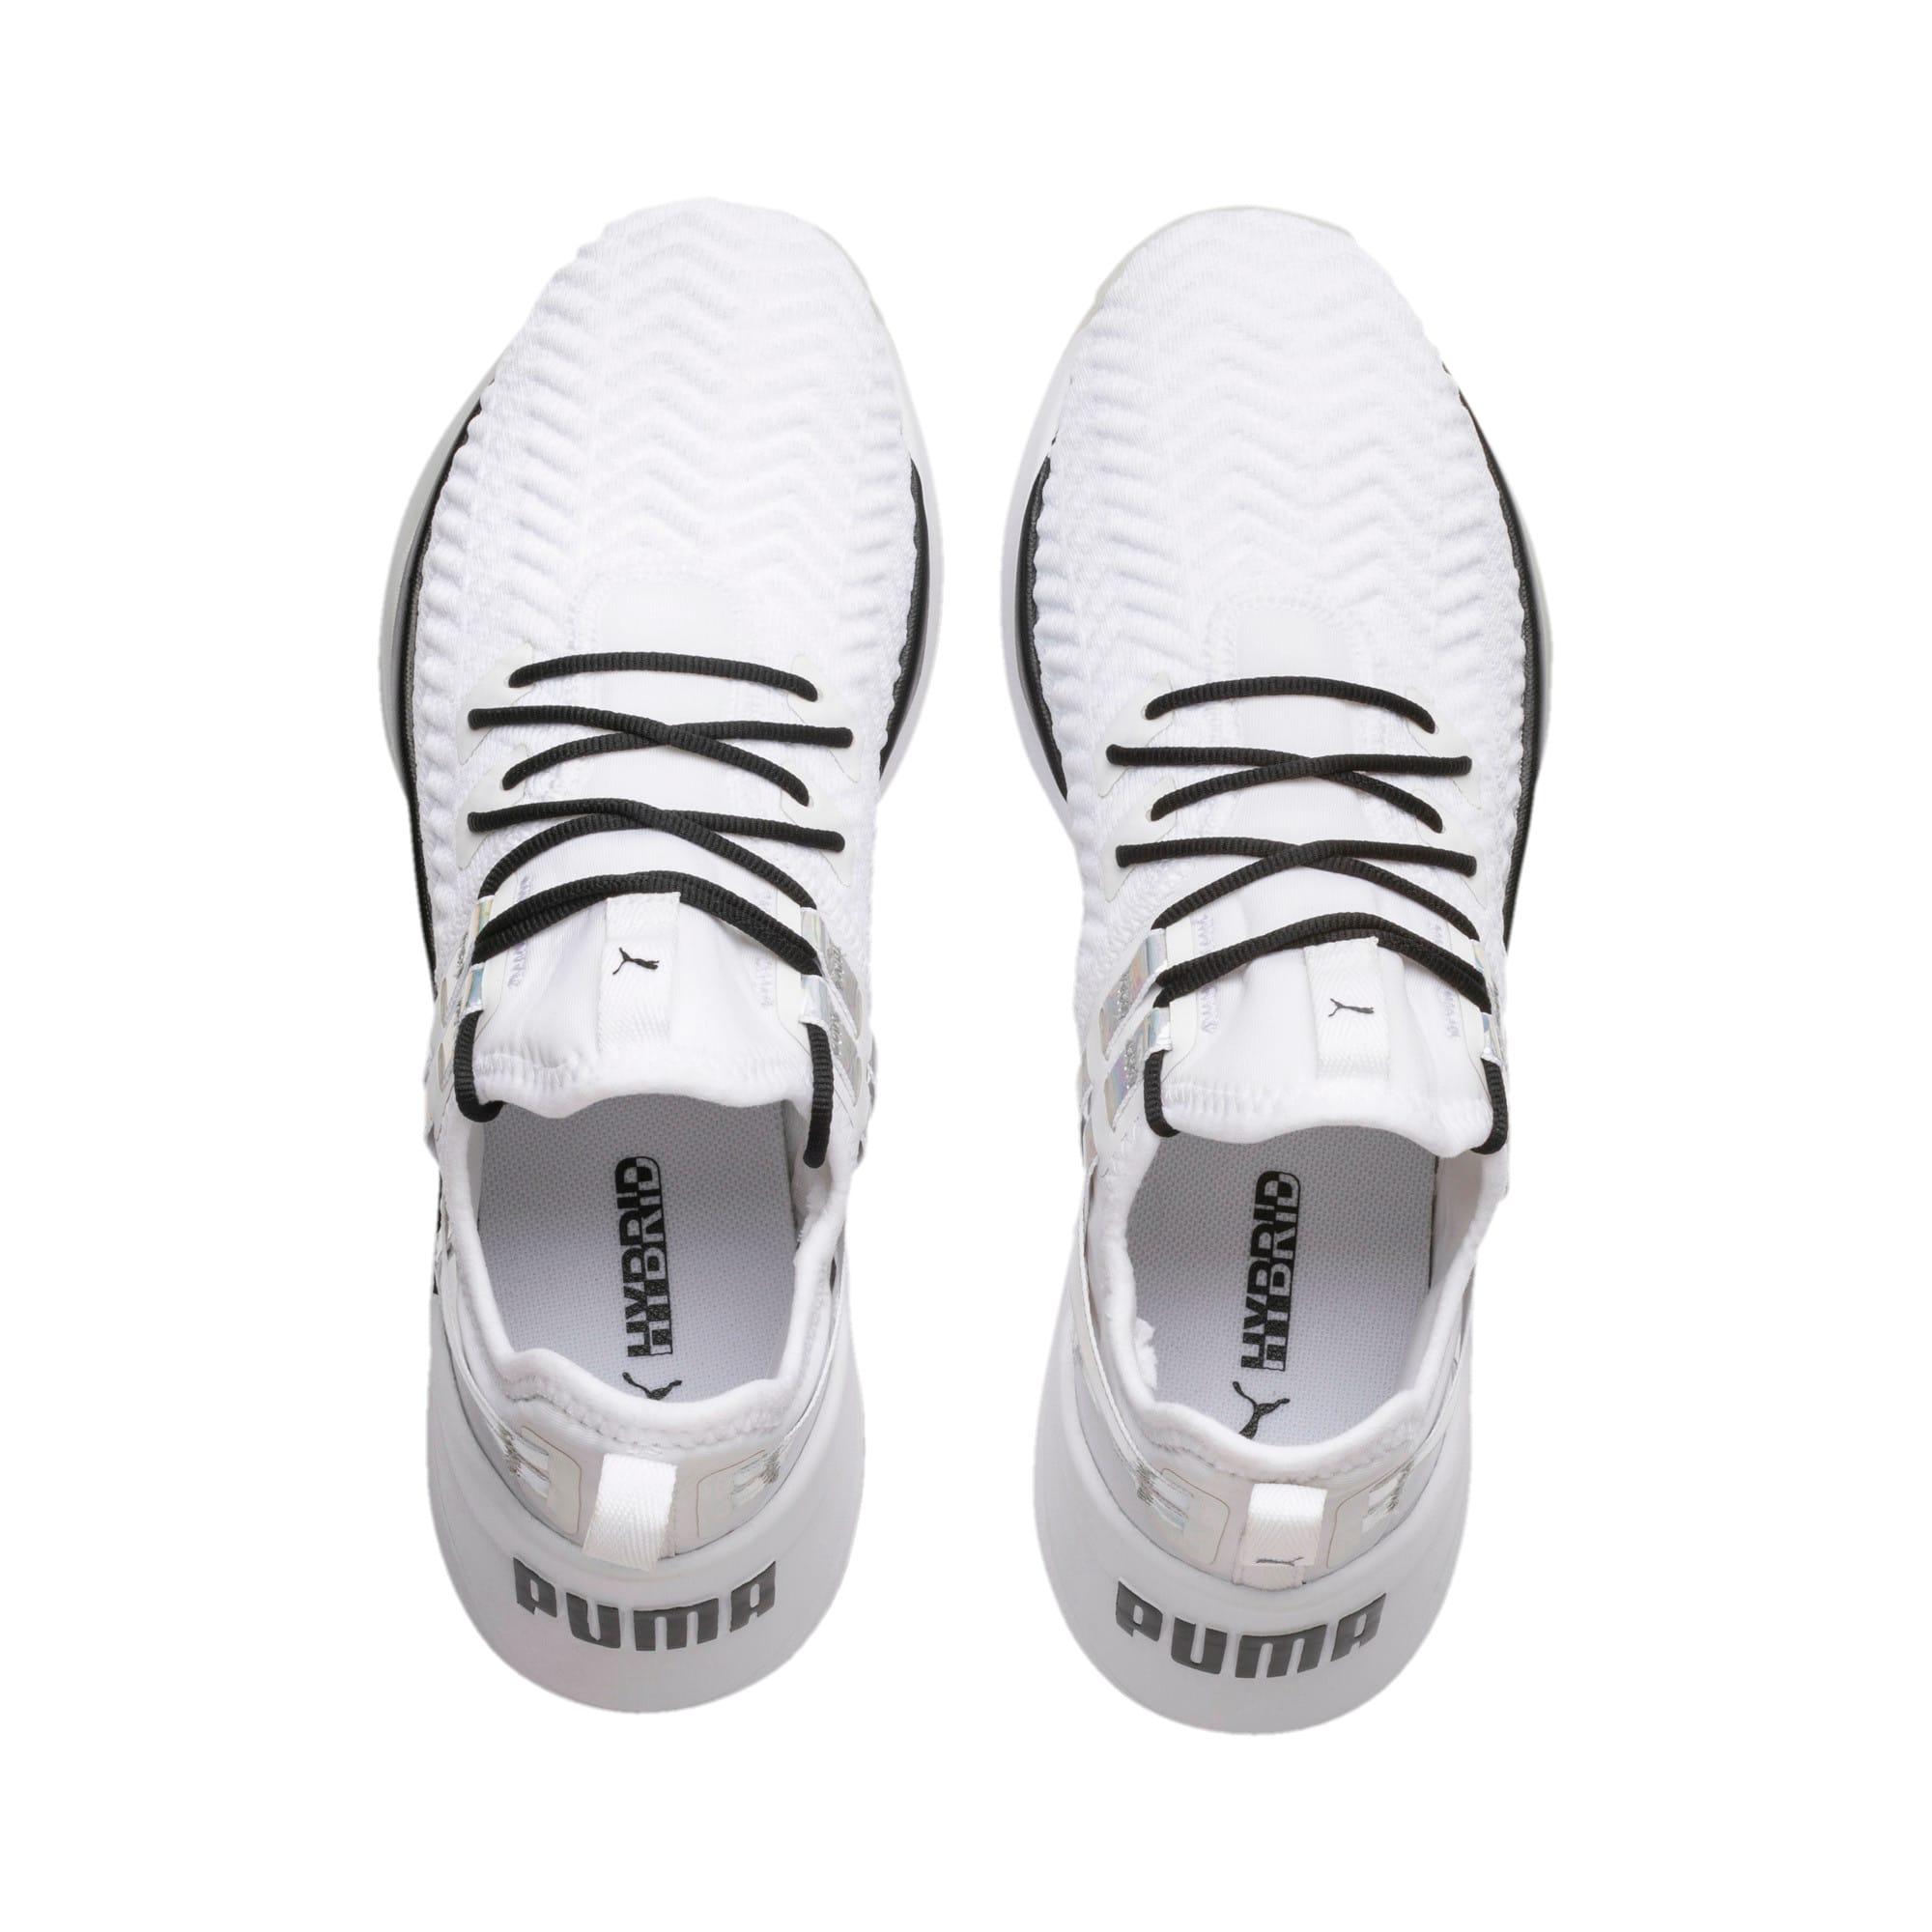 Thumbnail 7 of Jaab XT Iridescent Trailblazer Women's Training Shoes, Puma White-Puma Black, medium